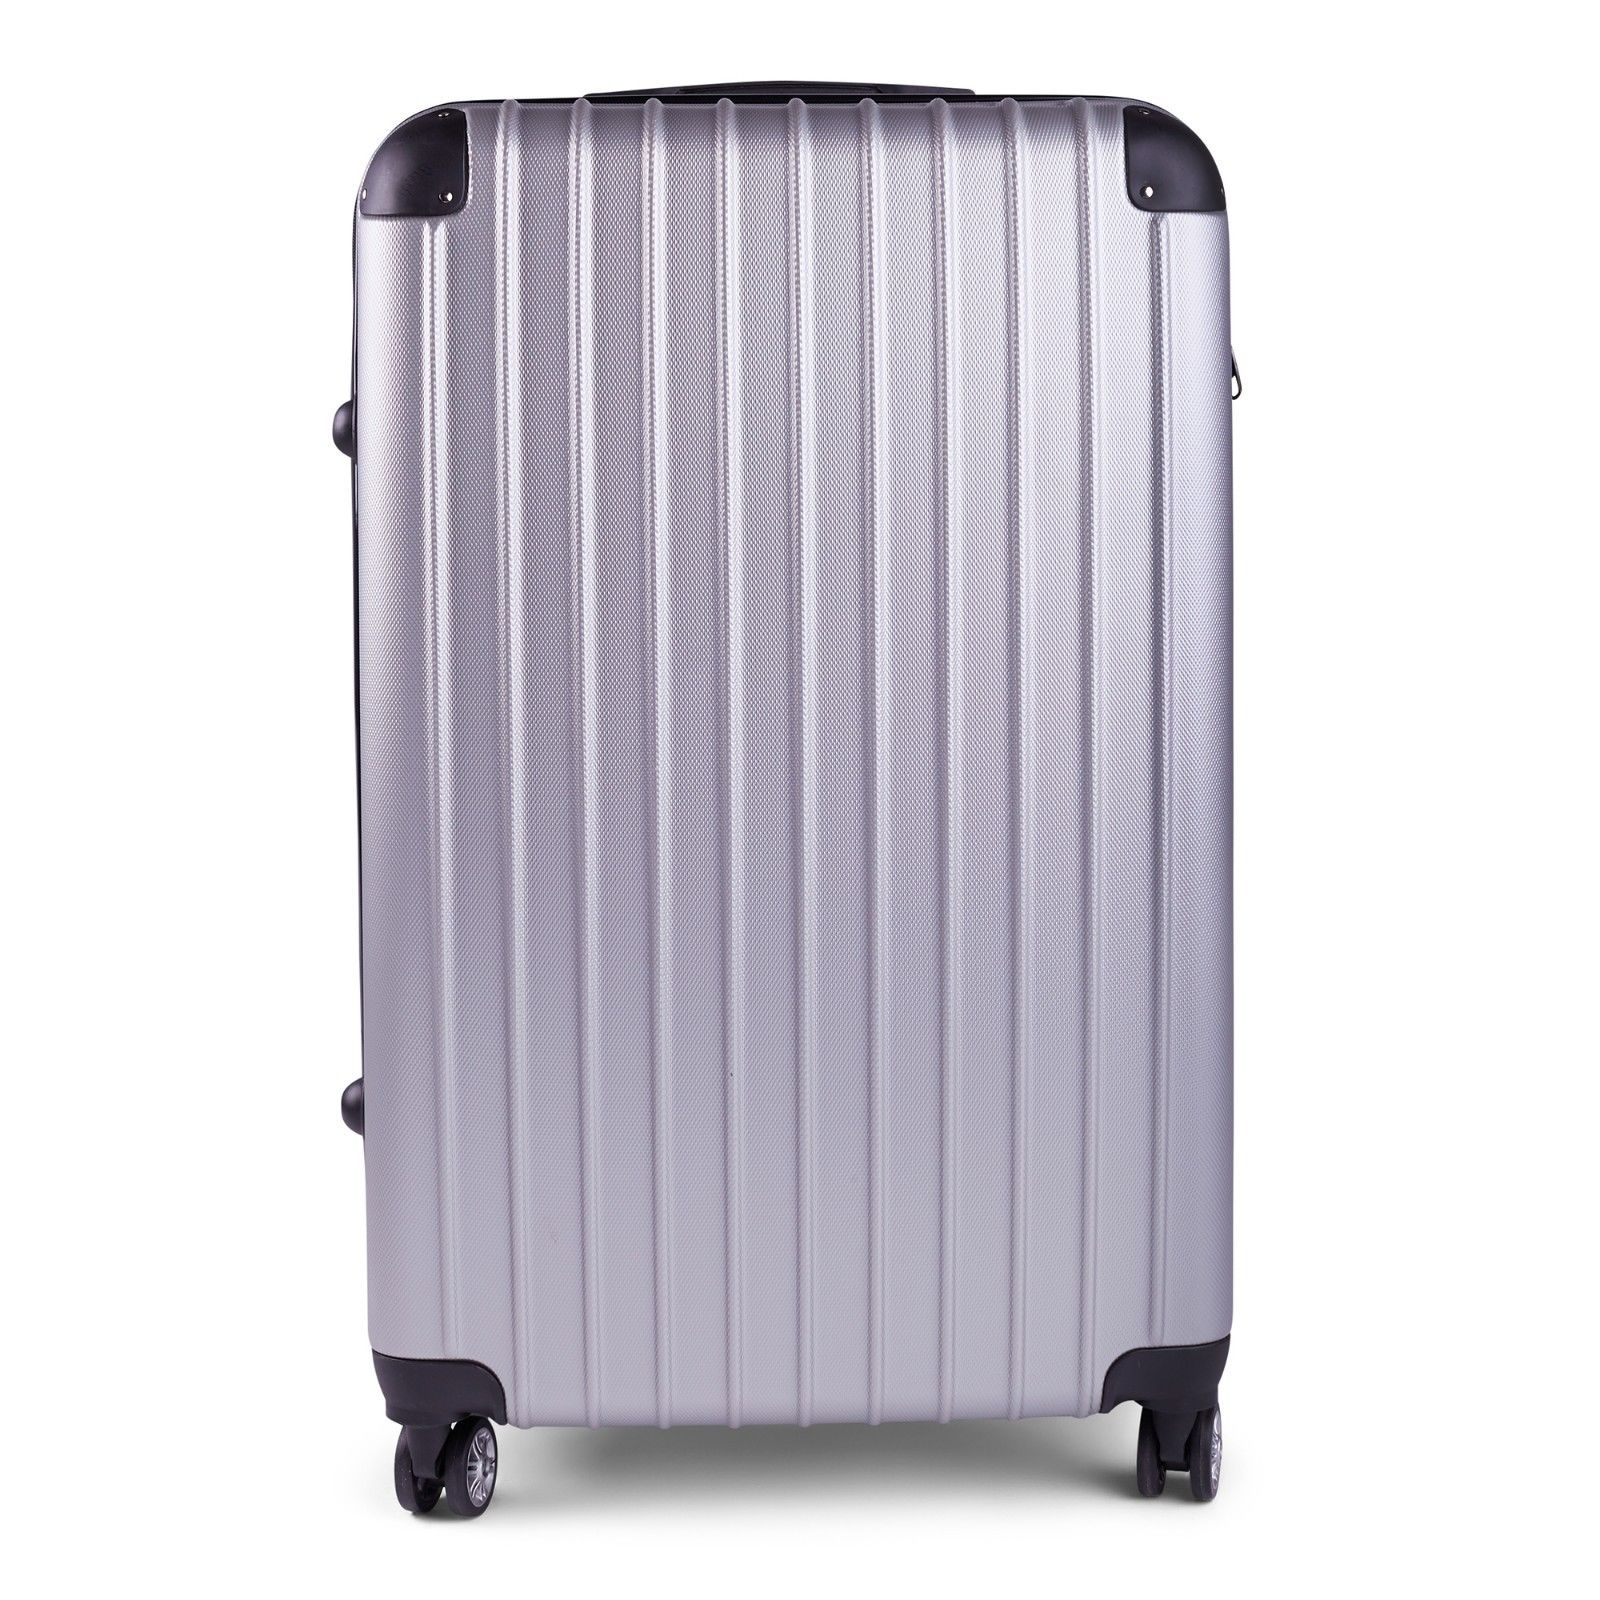 Milano-Premium-3pc-ABS-Luggage-Suitcase-Luxury-Hard-Case-Shockproof-Travel-Set thumbnail 30